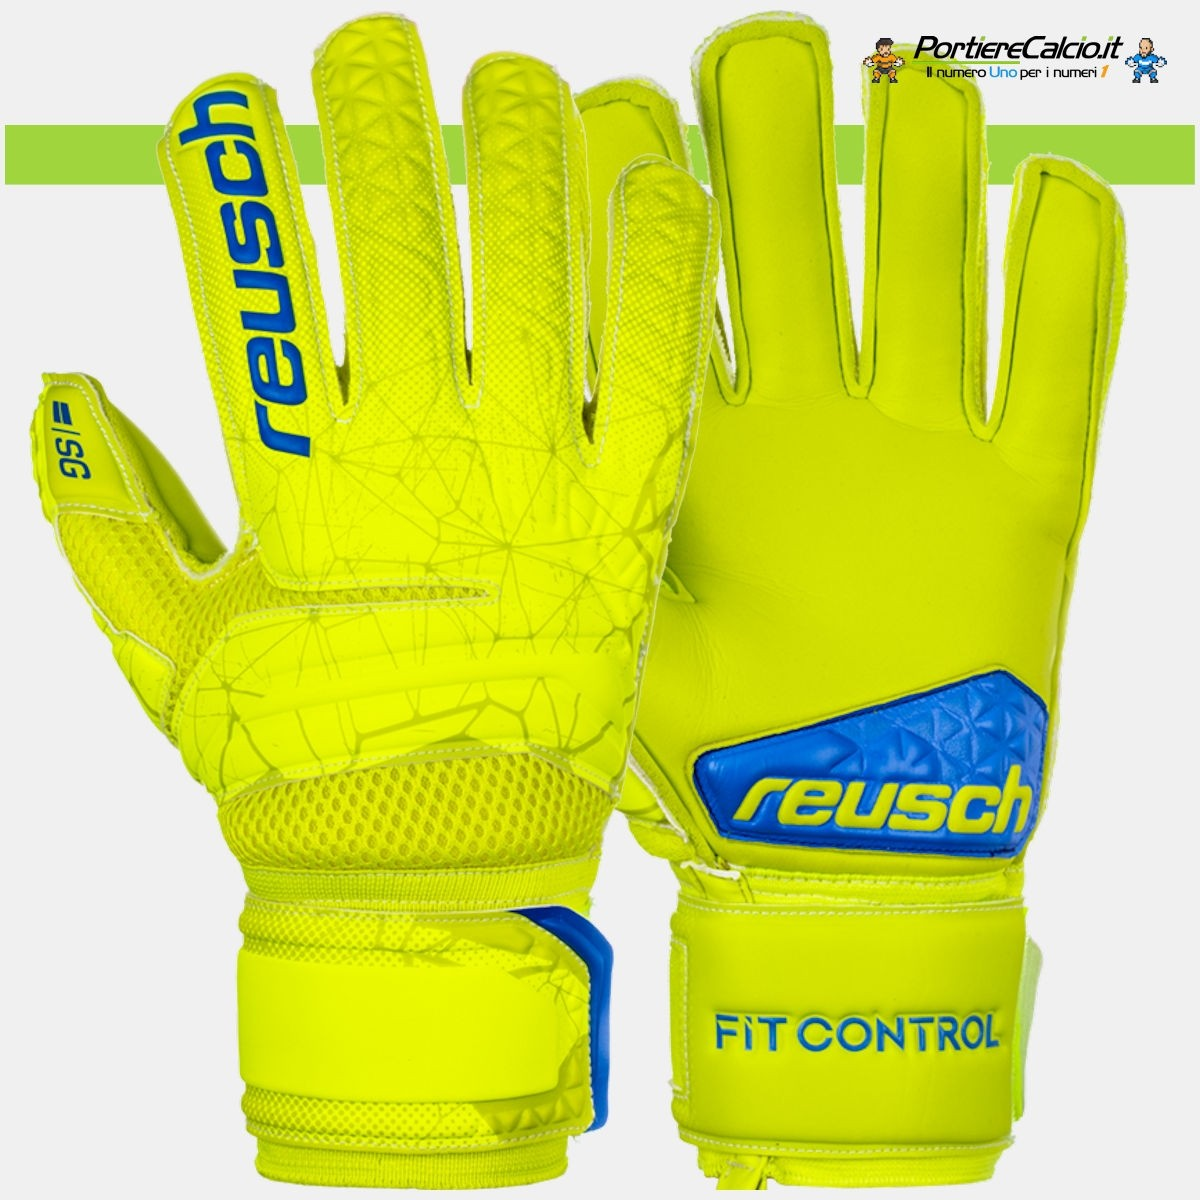 Guanti da portiere Reusch Fit Control SG Extra Finger Support junior ... d3fc6125d159